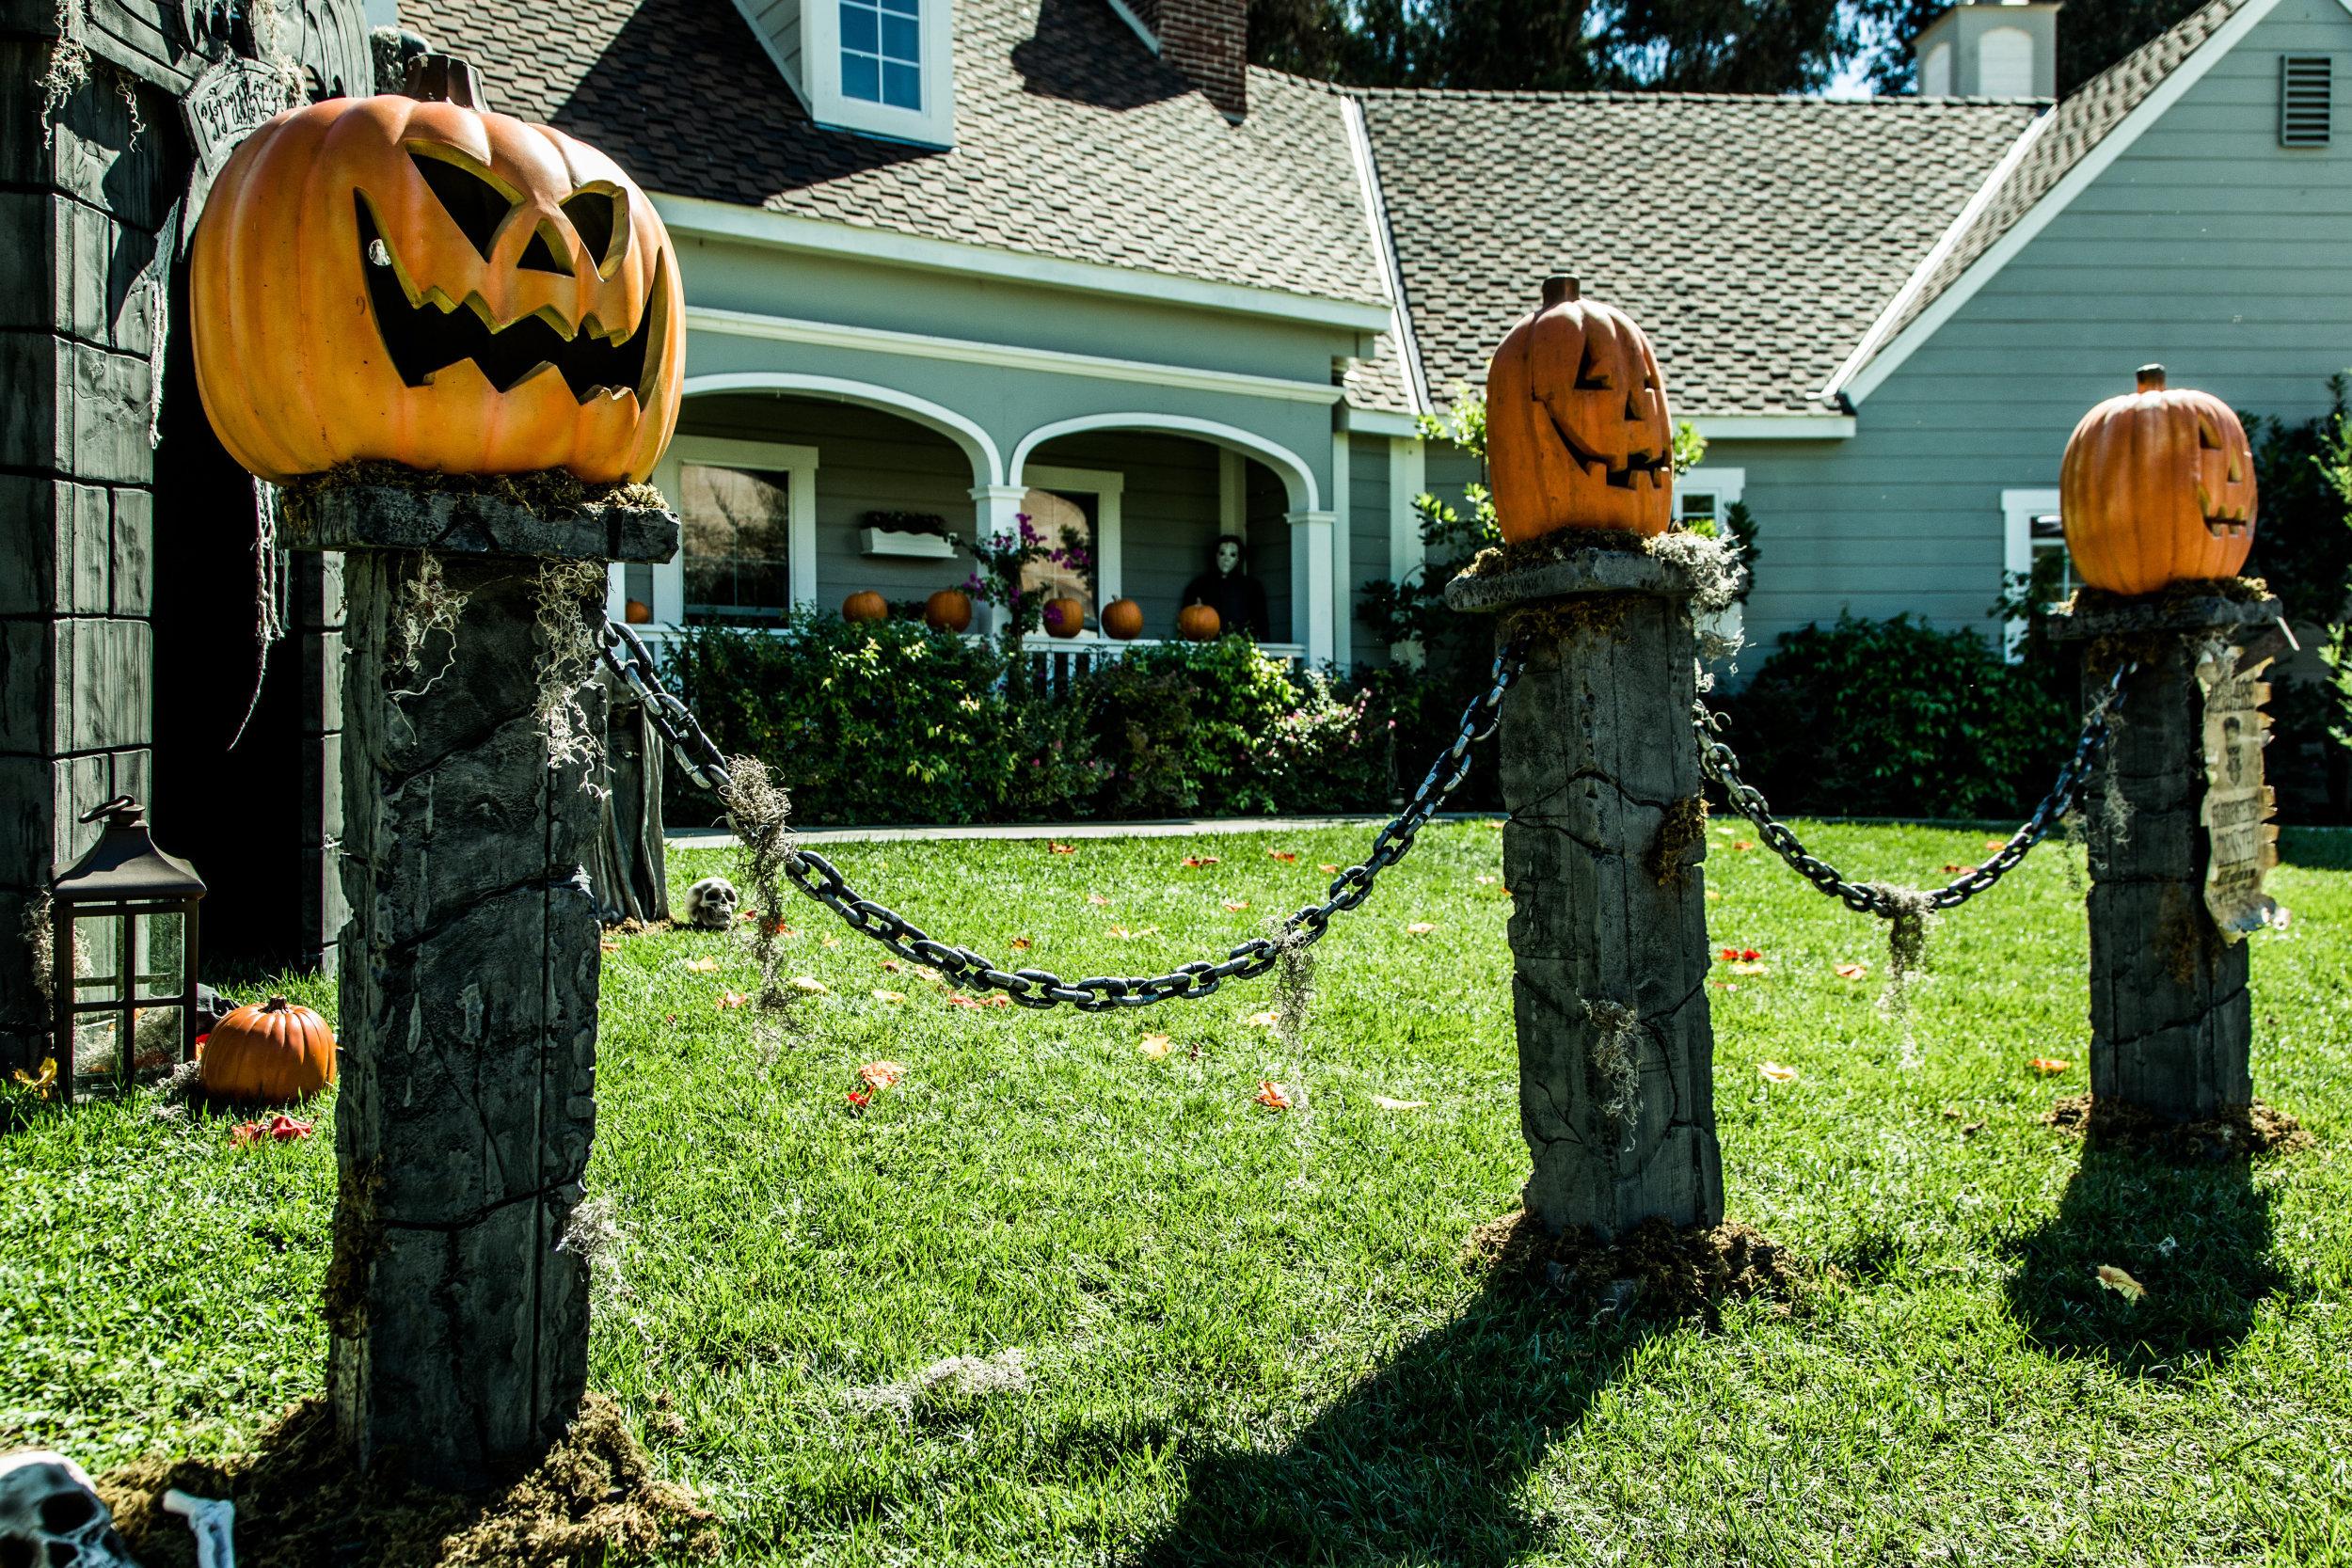 How To Diy Pumpkin Fence Pillars Home Amp Family